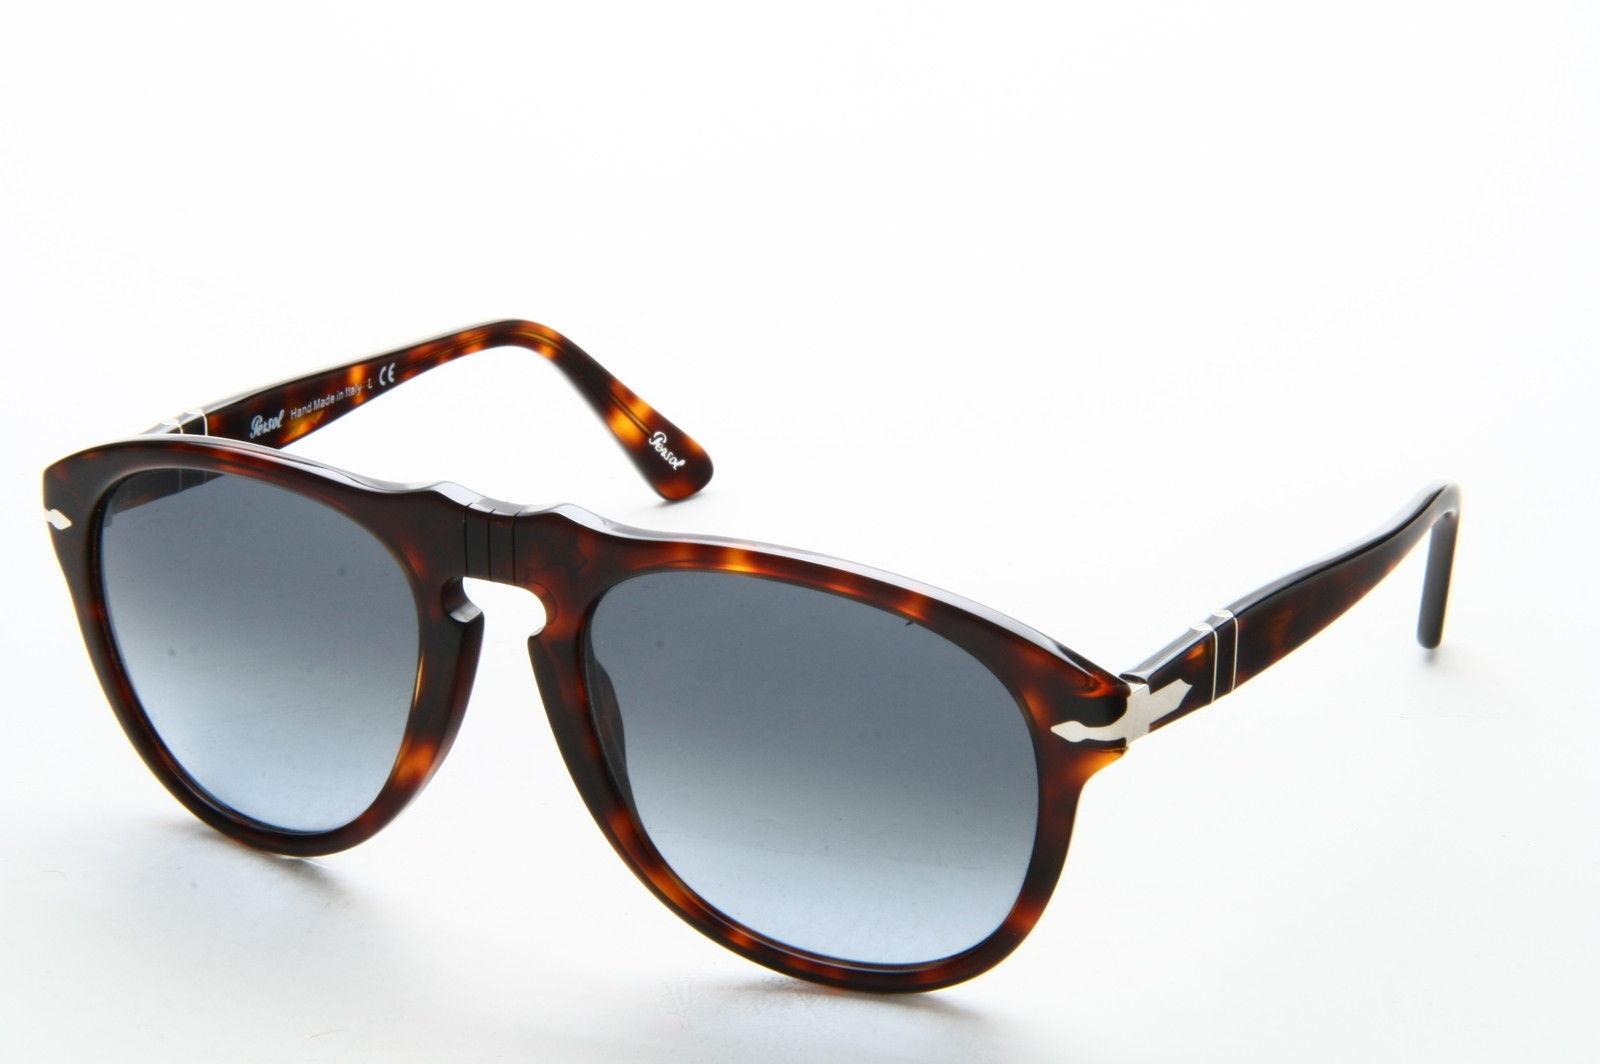 6cbee5b11ca Persol 649 Aviator Sunglasses 24 86 Havana Tortoise   Blue Gradient ...